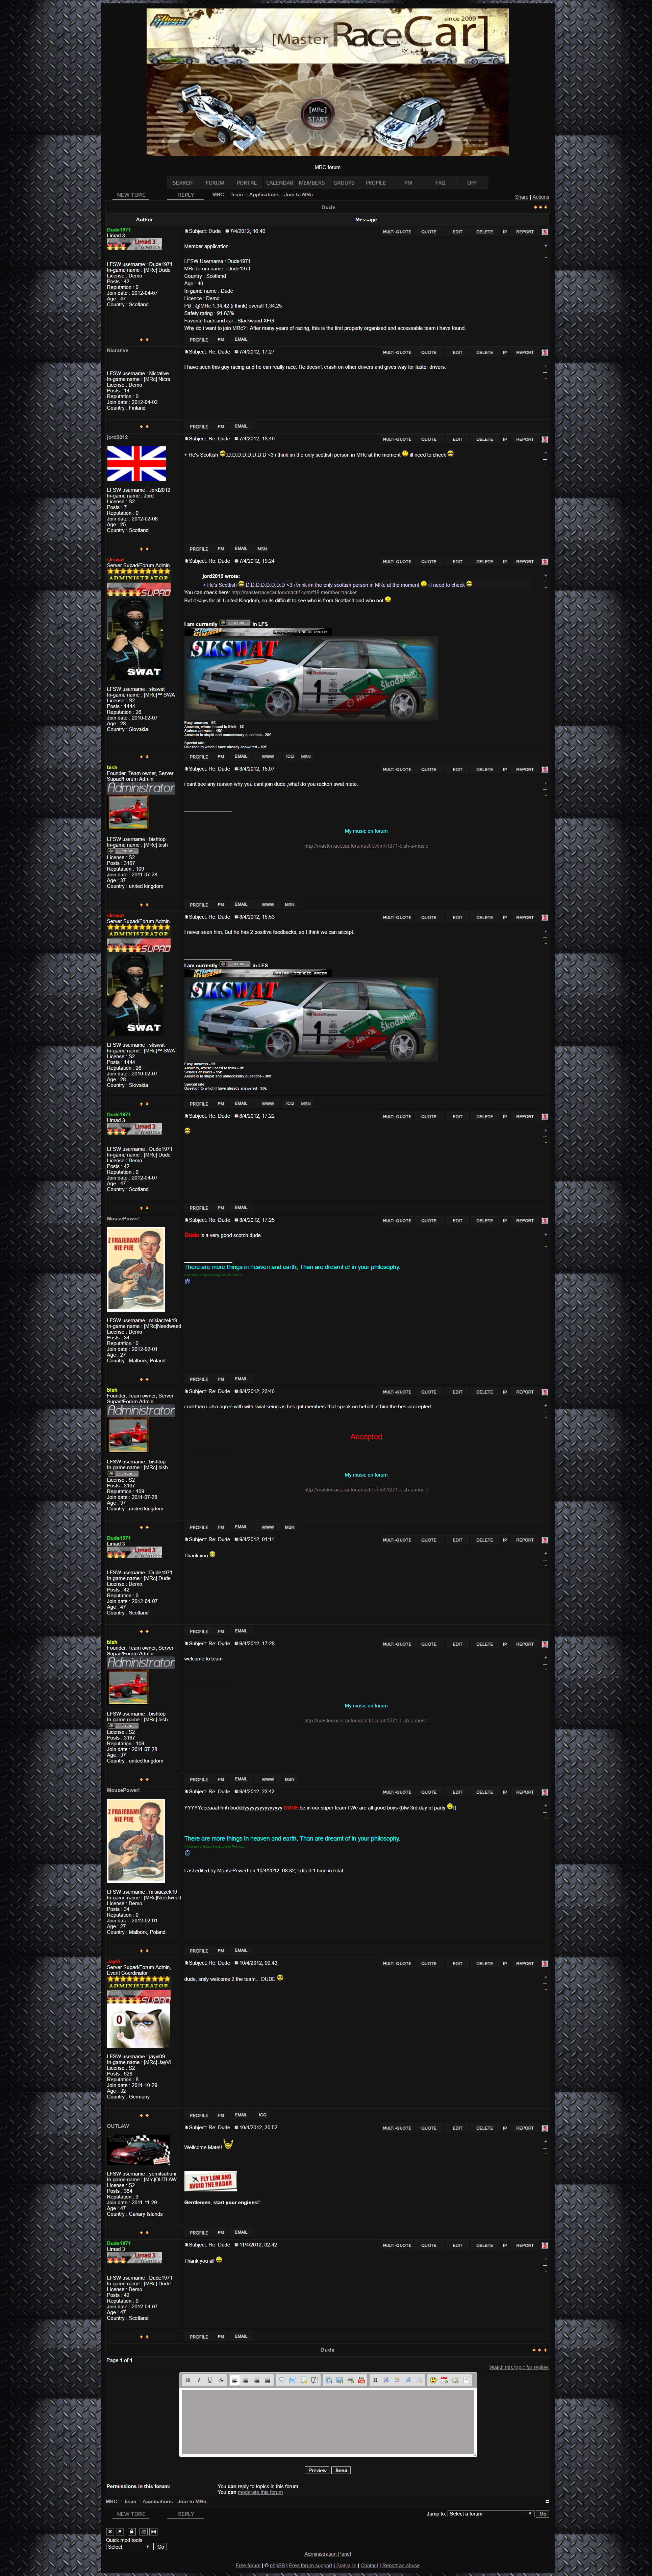 [Image: screencapture-masterracecar-forumactif-t...-27-56.jpg]